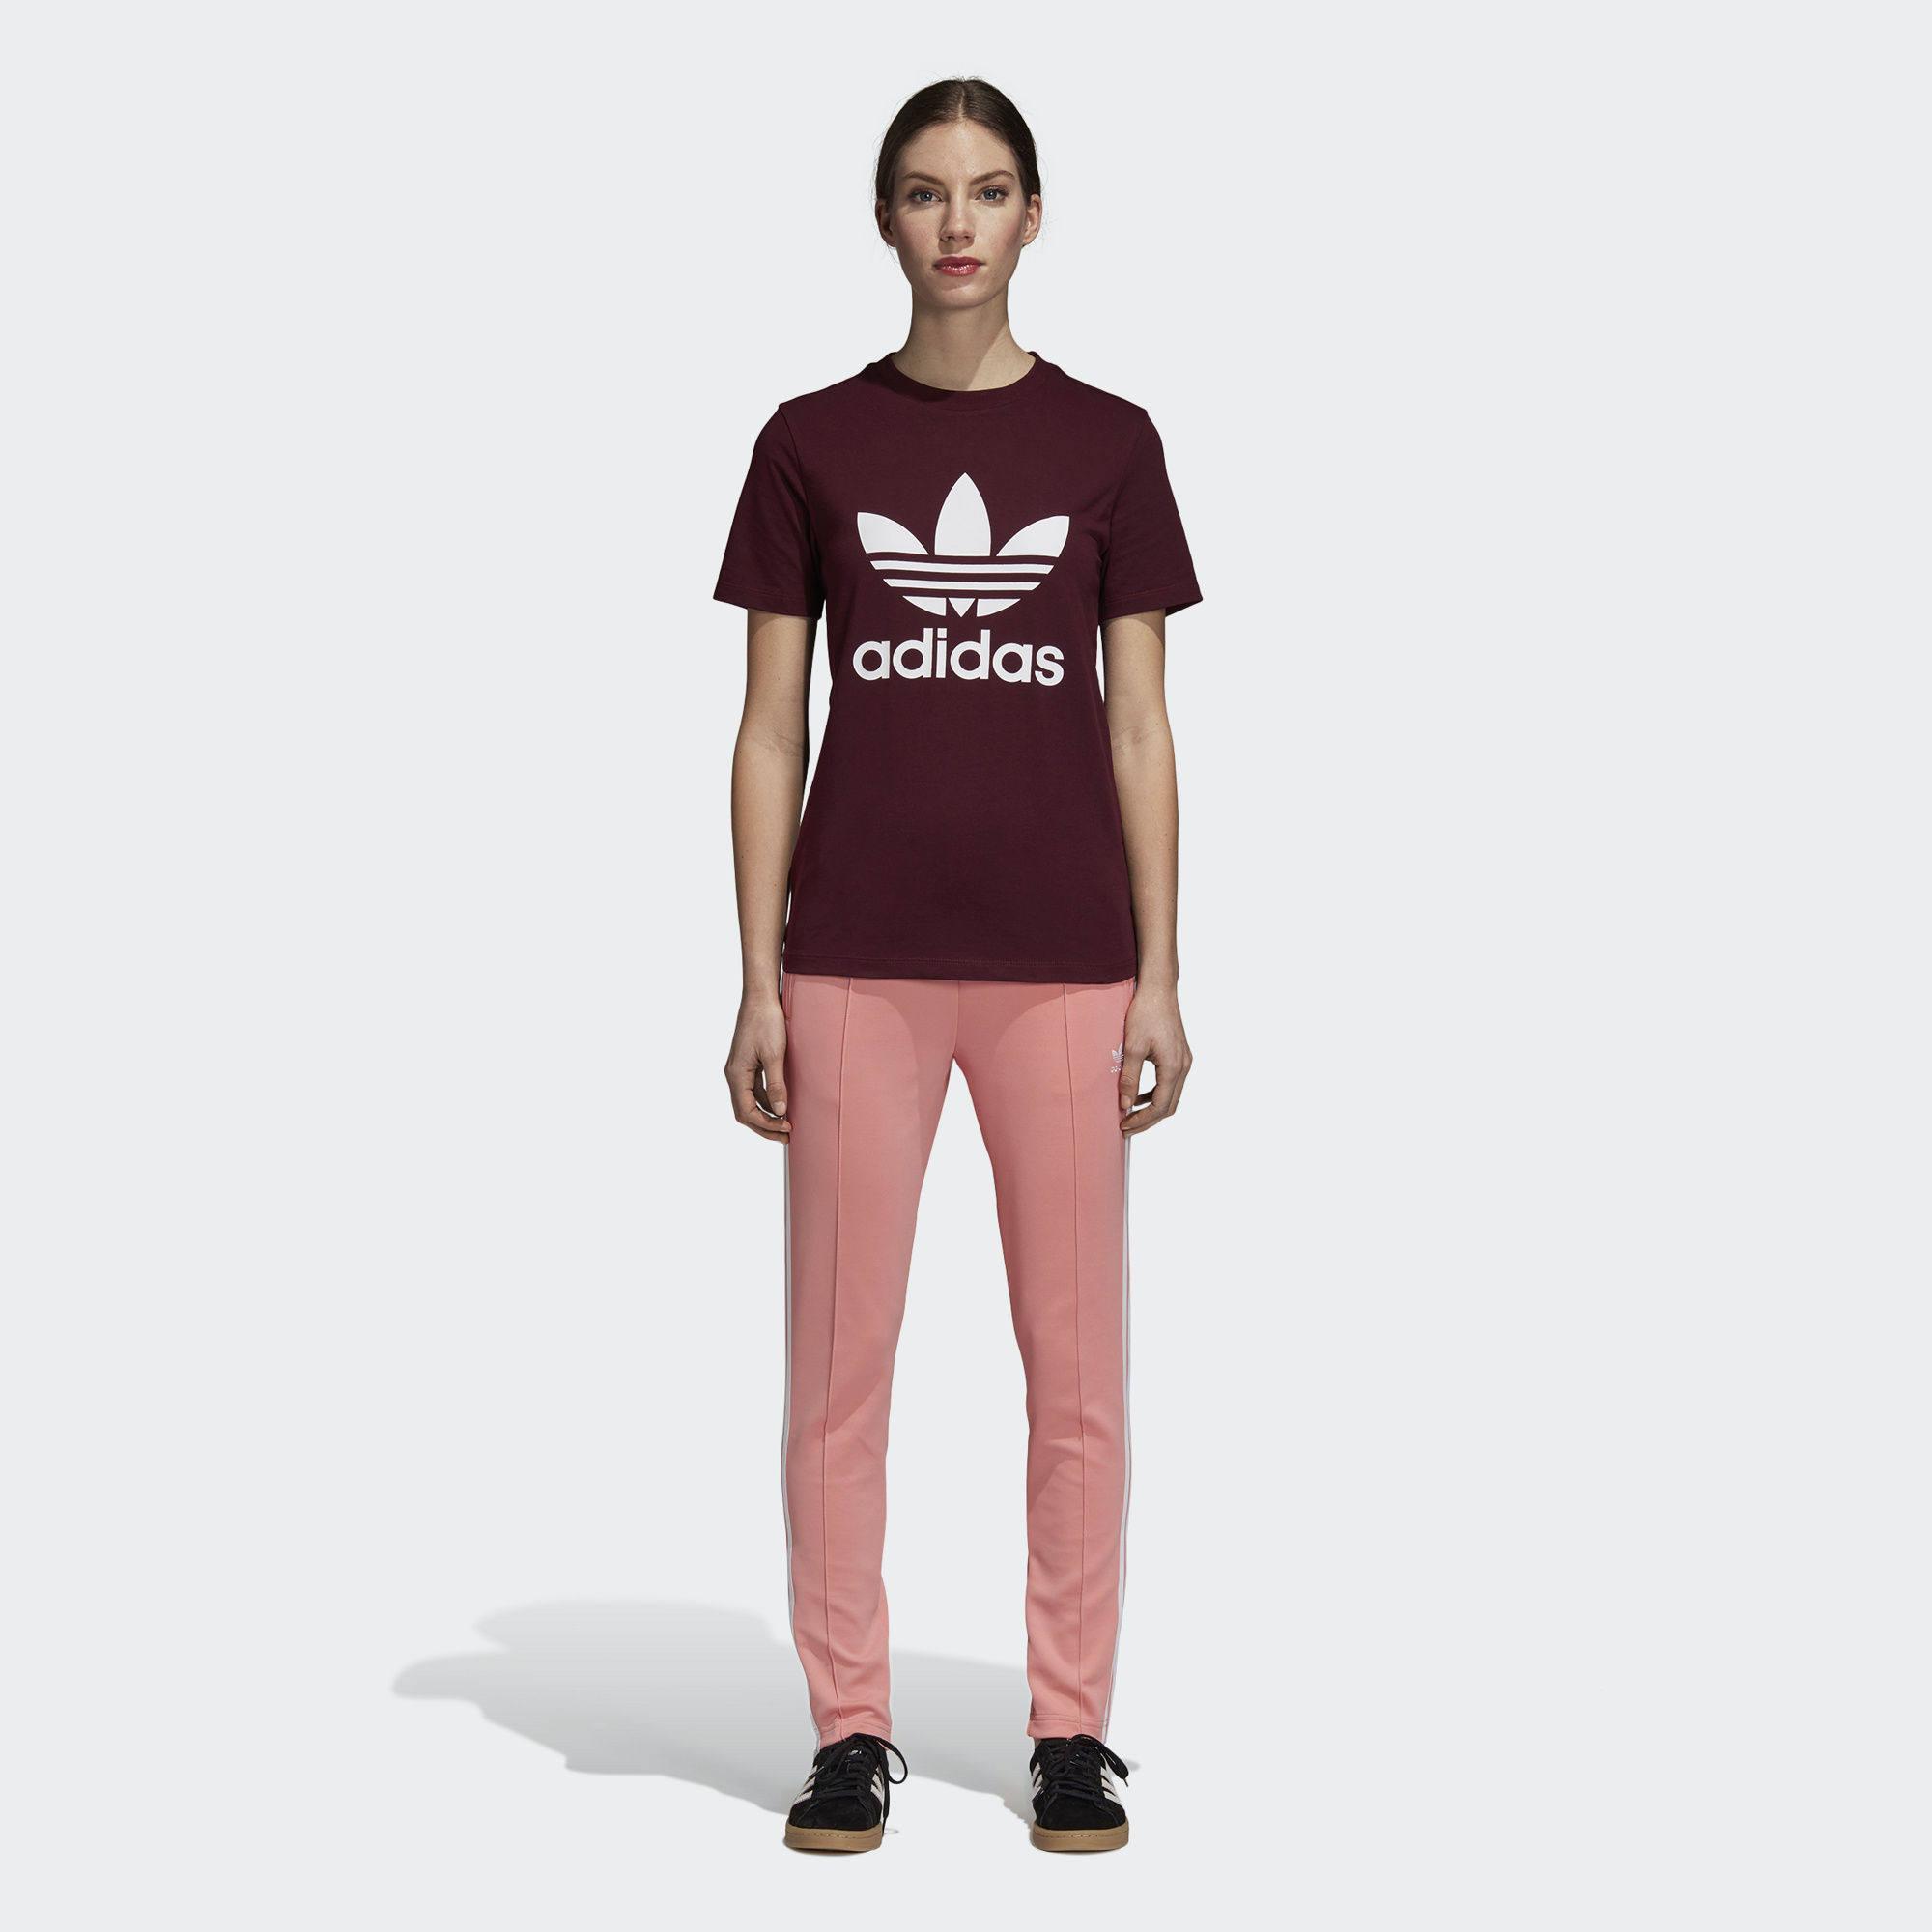 Pantaloni Adidas Adidas Track Pantaloni Rose OriginalsTactile Track Rose Track Adidas Pantaloni OriginalsTactile NPmOyv0w8n